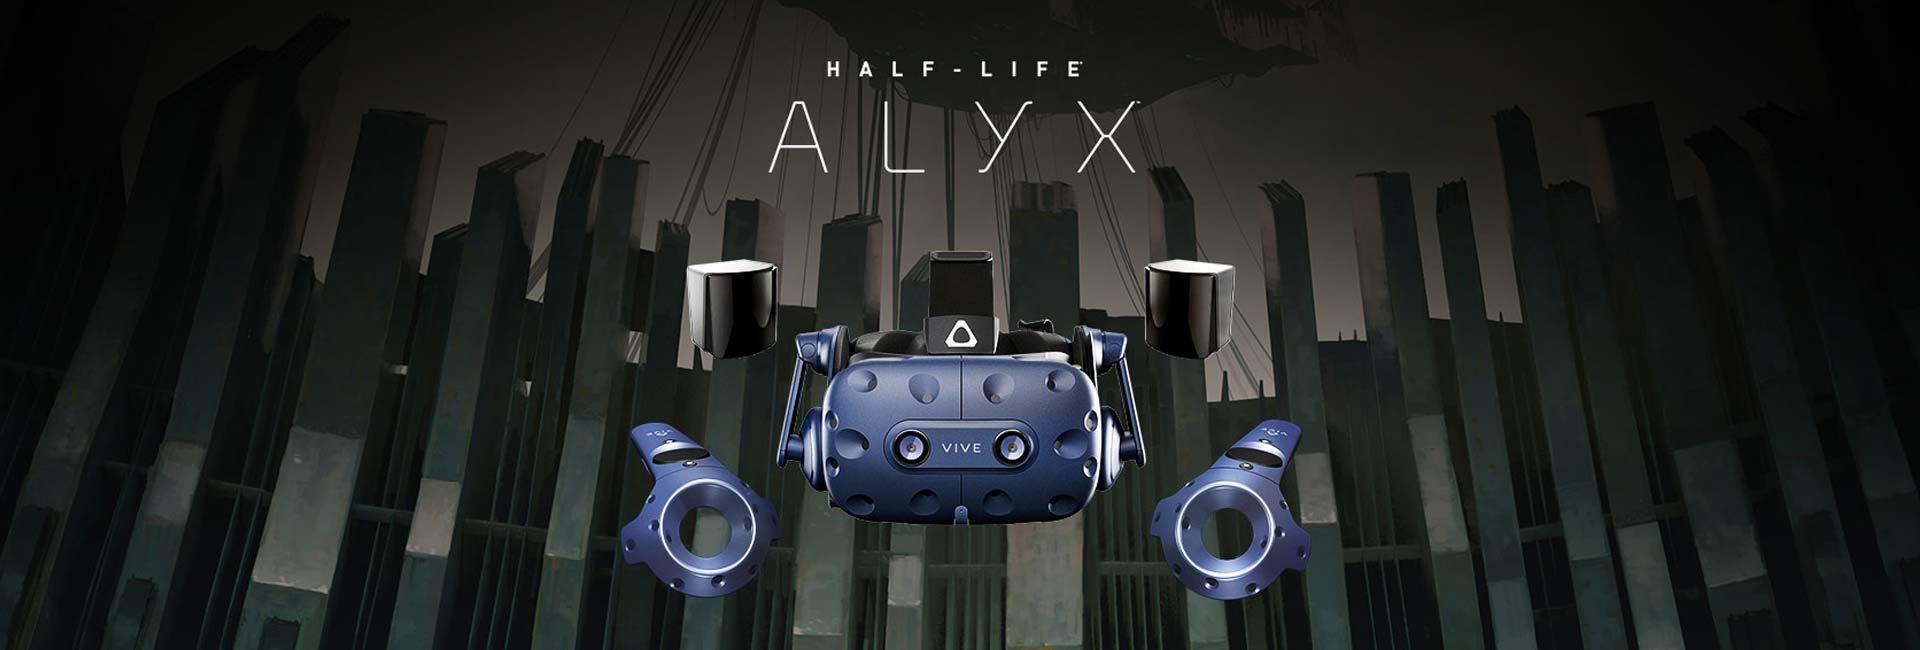 vive pro hl-alyx